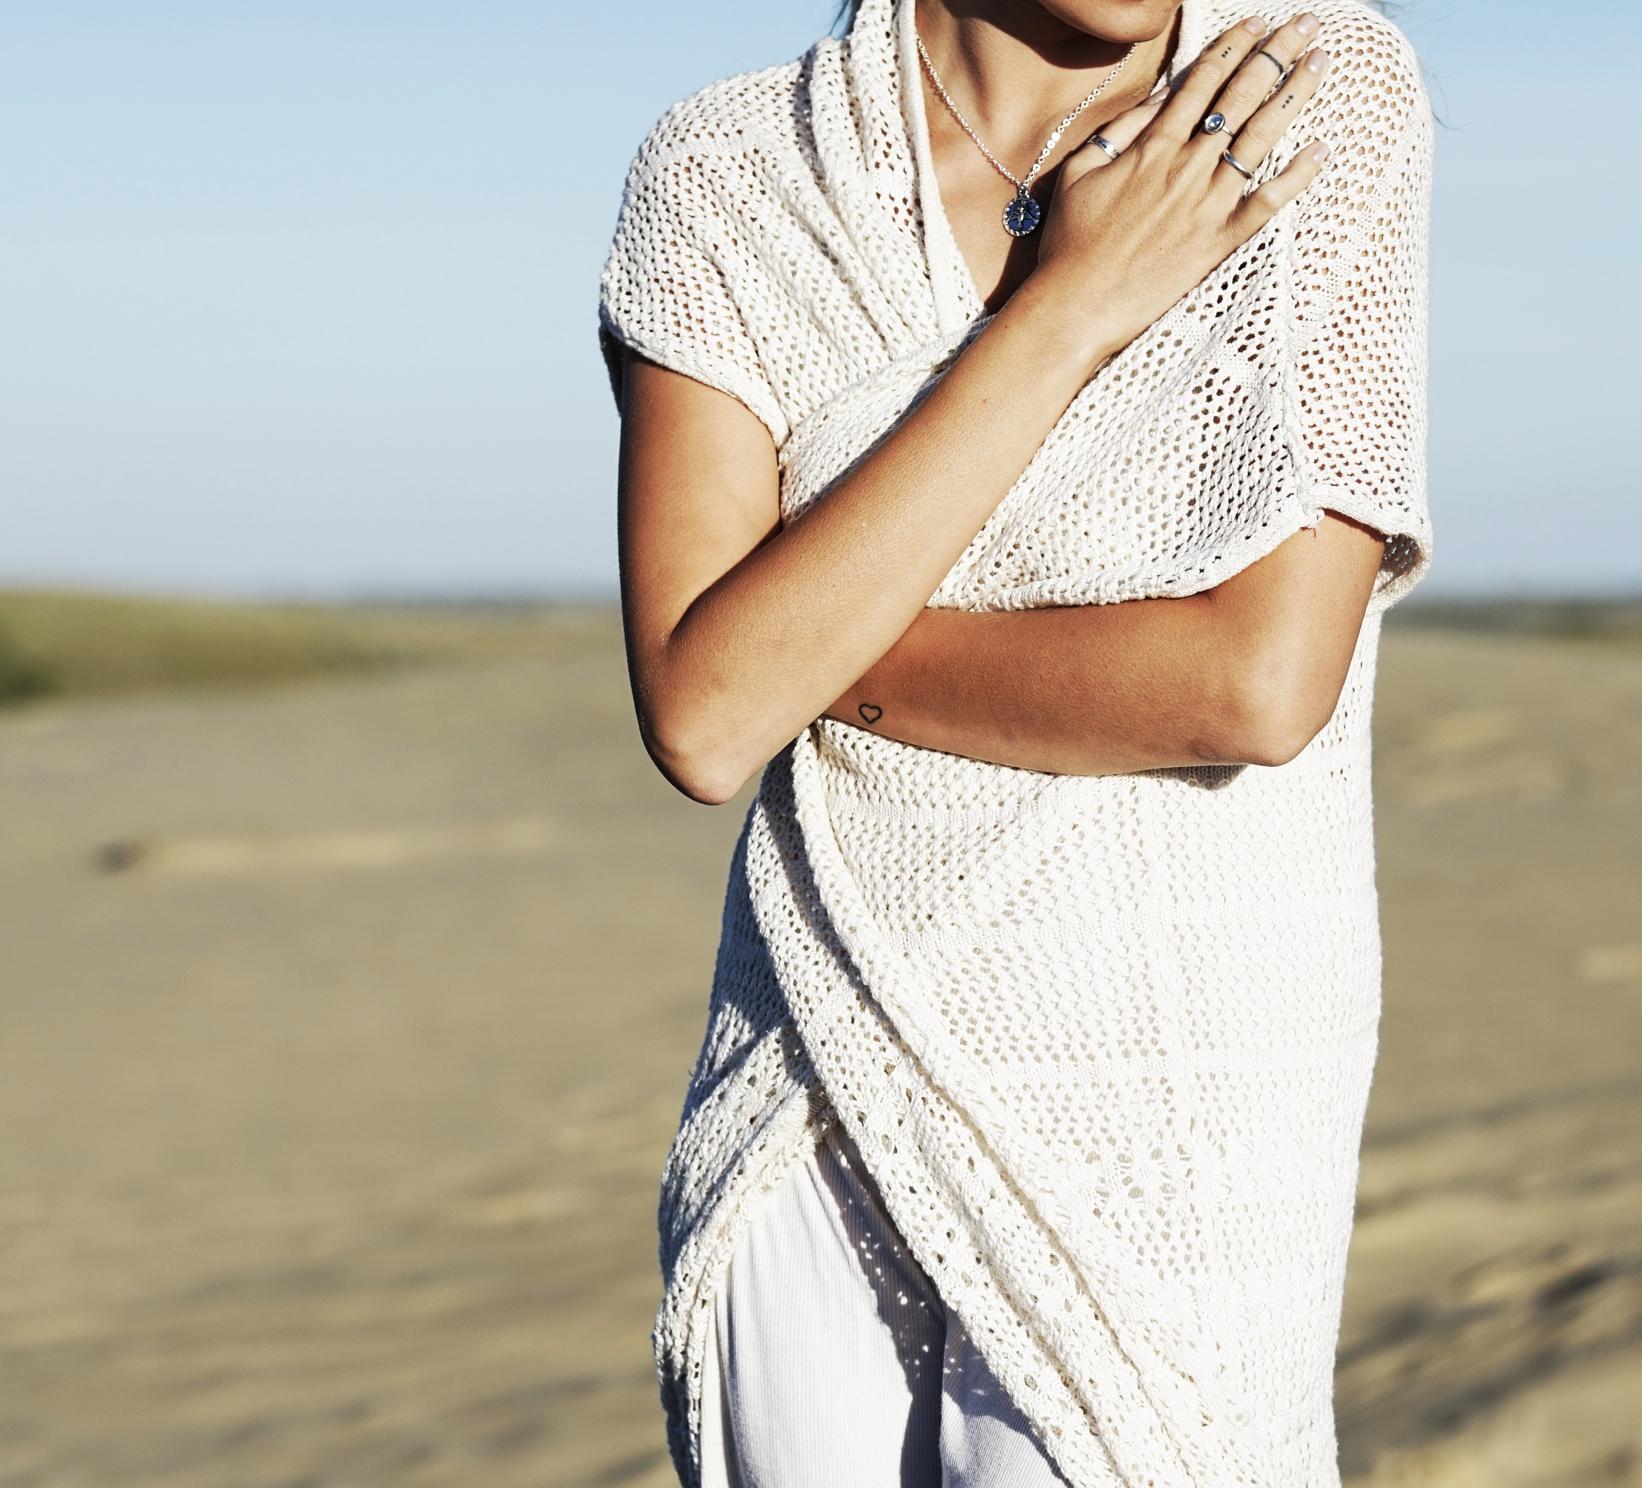 Follow the Sun Charm Necklace. Duster Cardigan: Billabong Women's